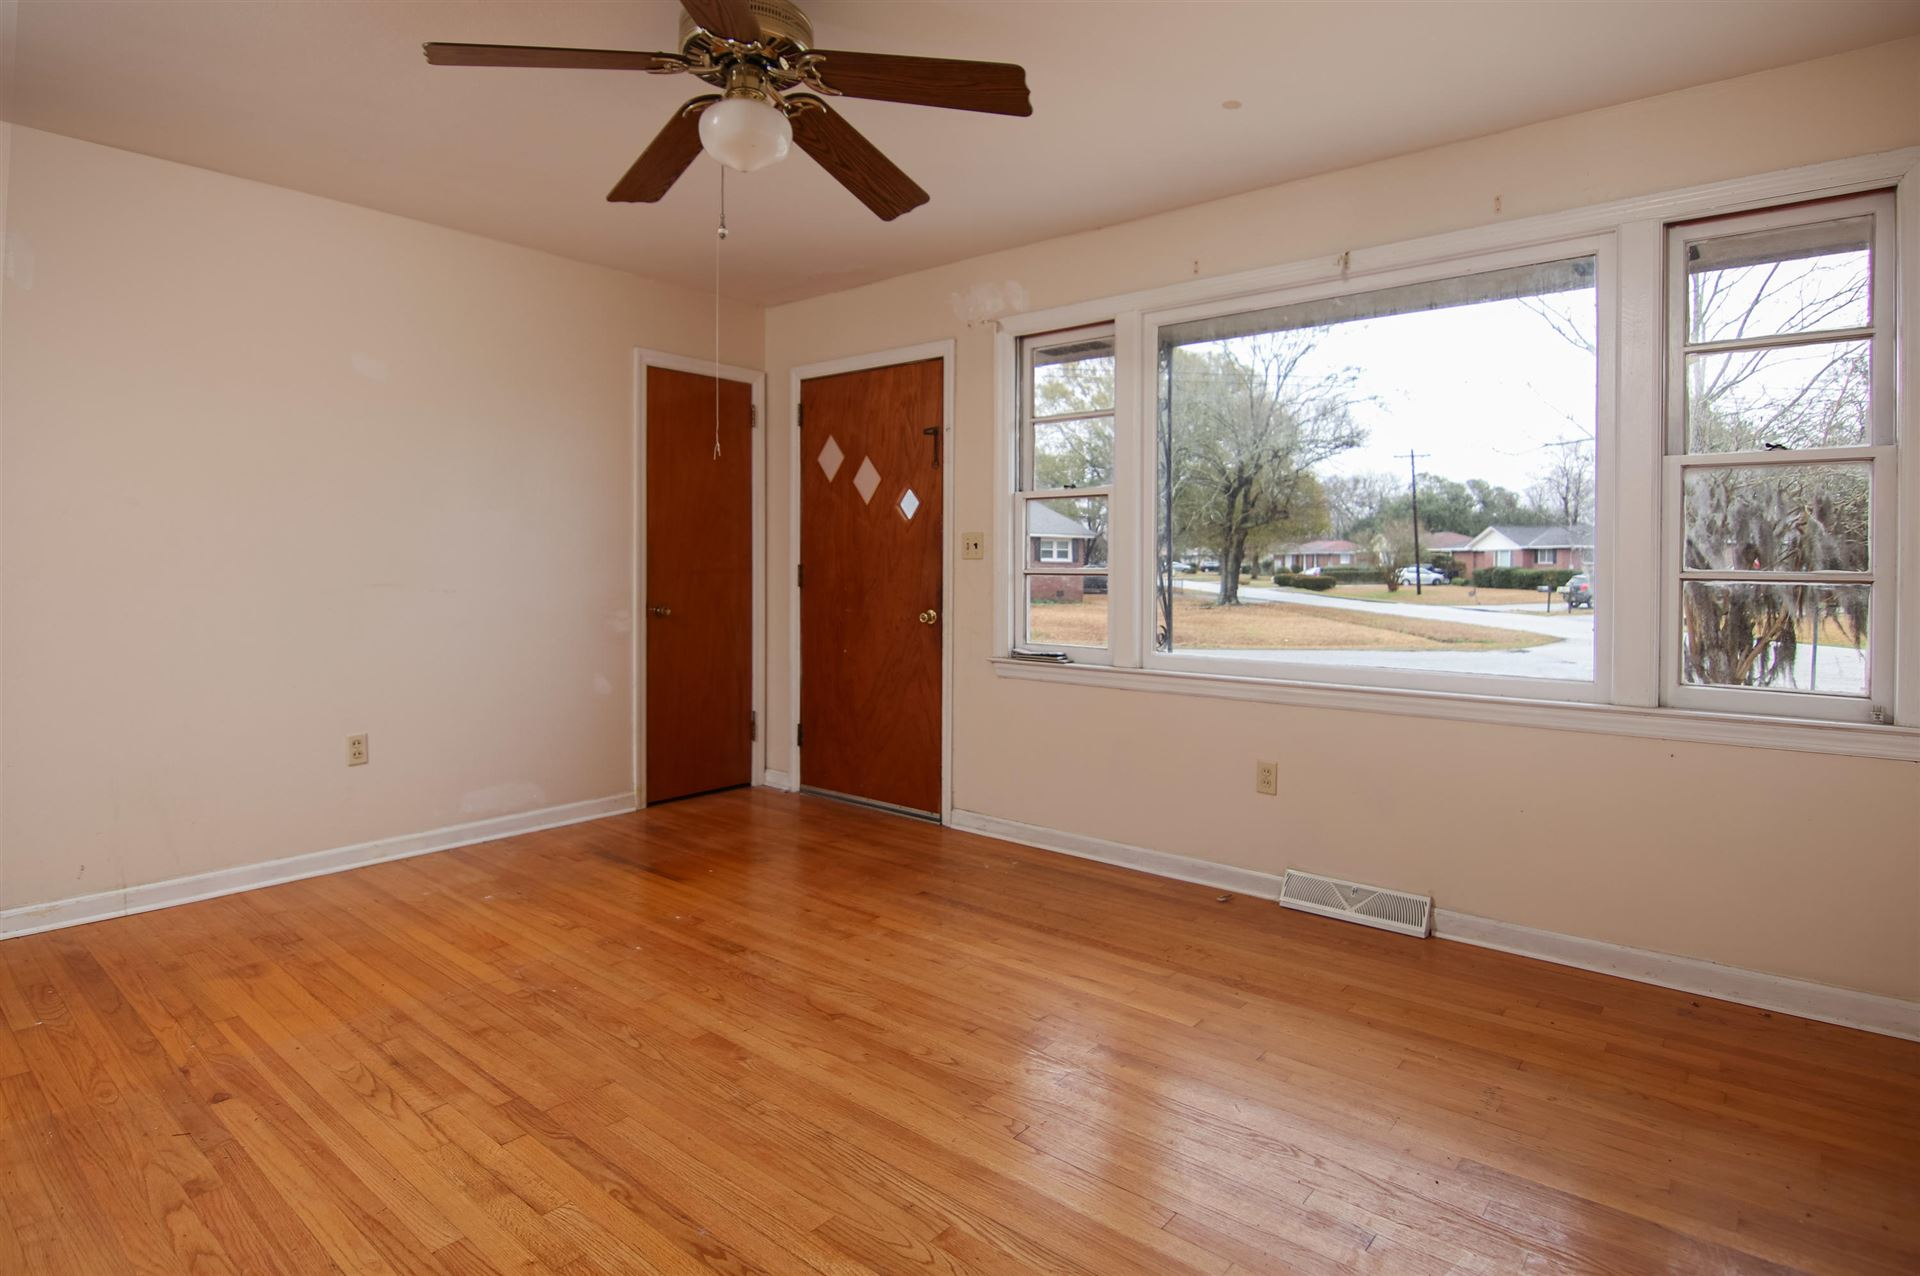 Photo of 4106 Olivia Drive, North Charleston, SC 29418 (MLS # 21004833)